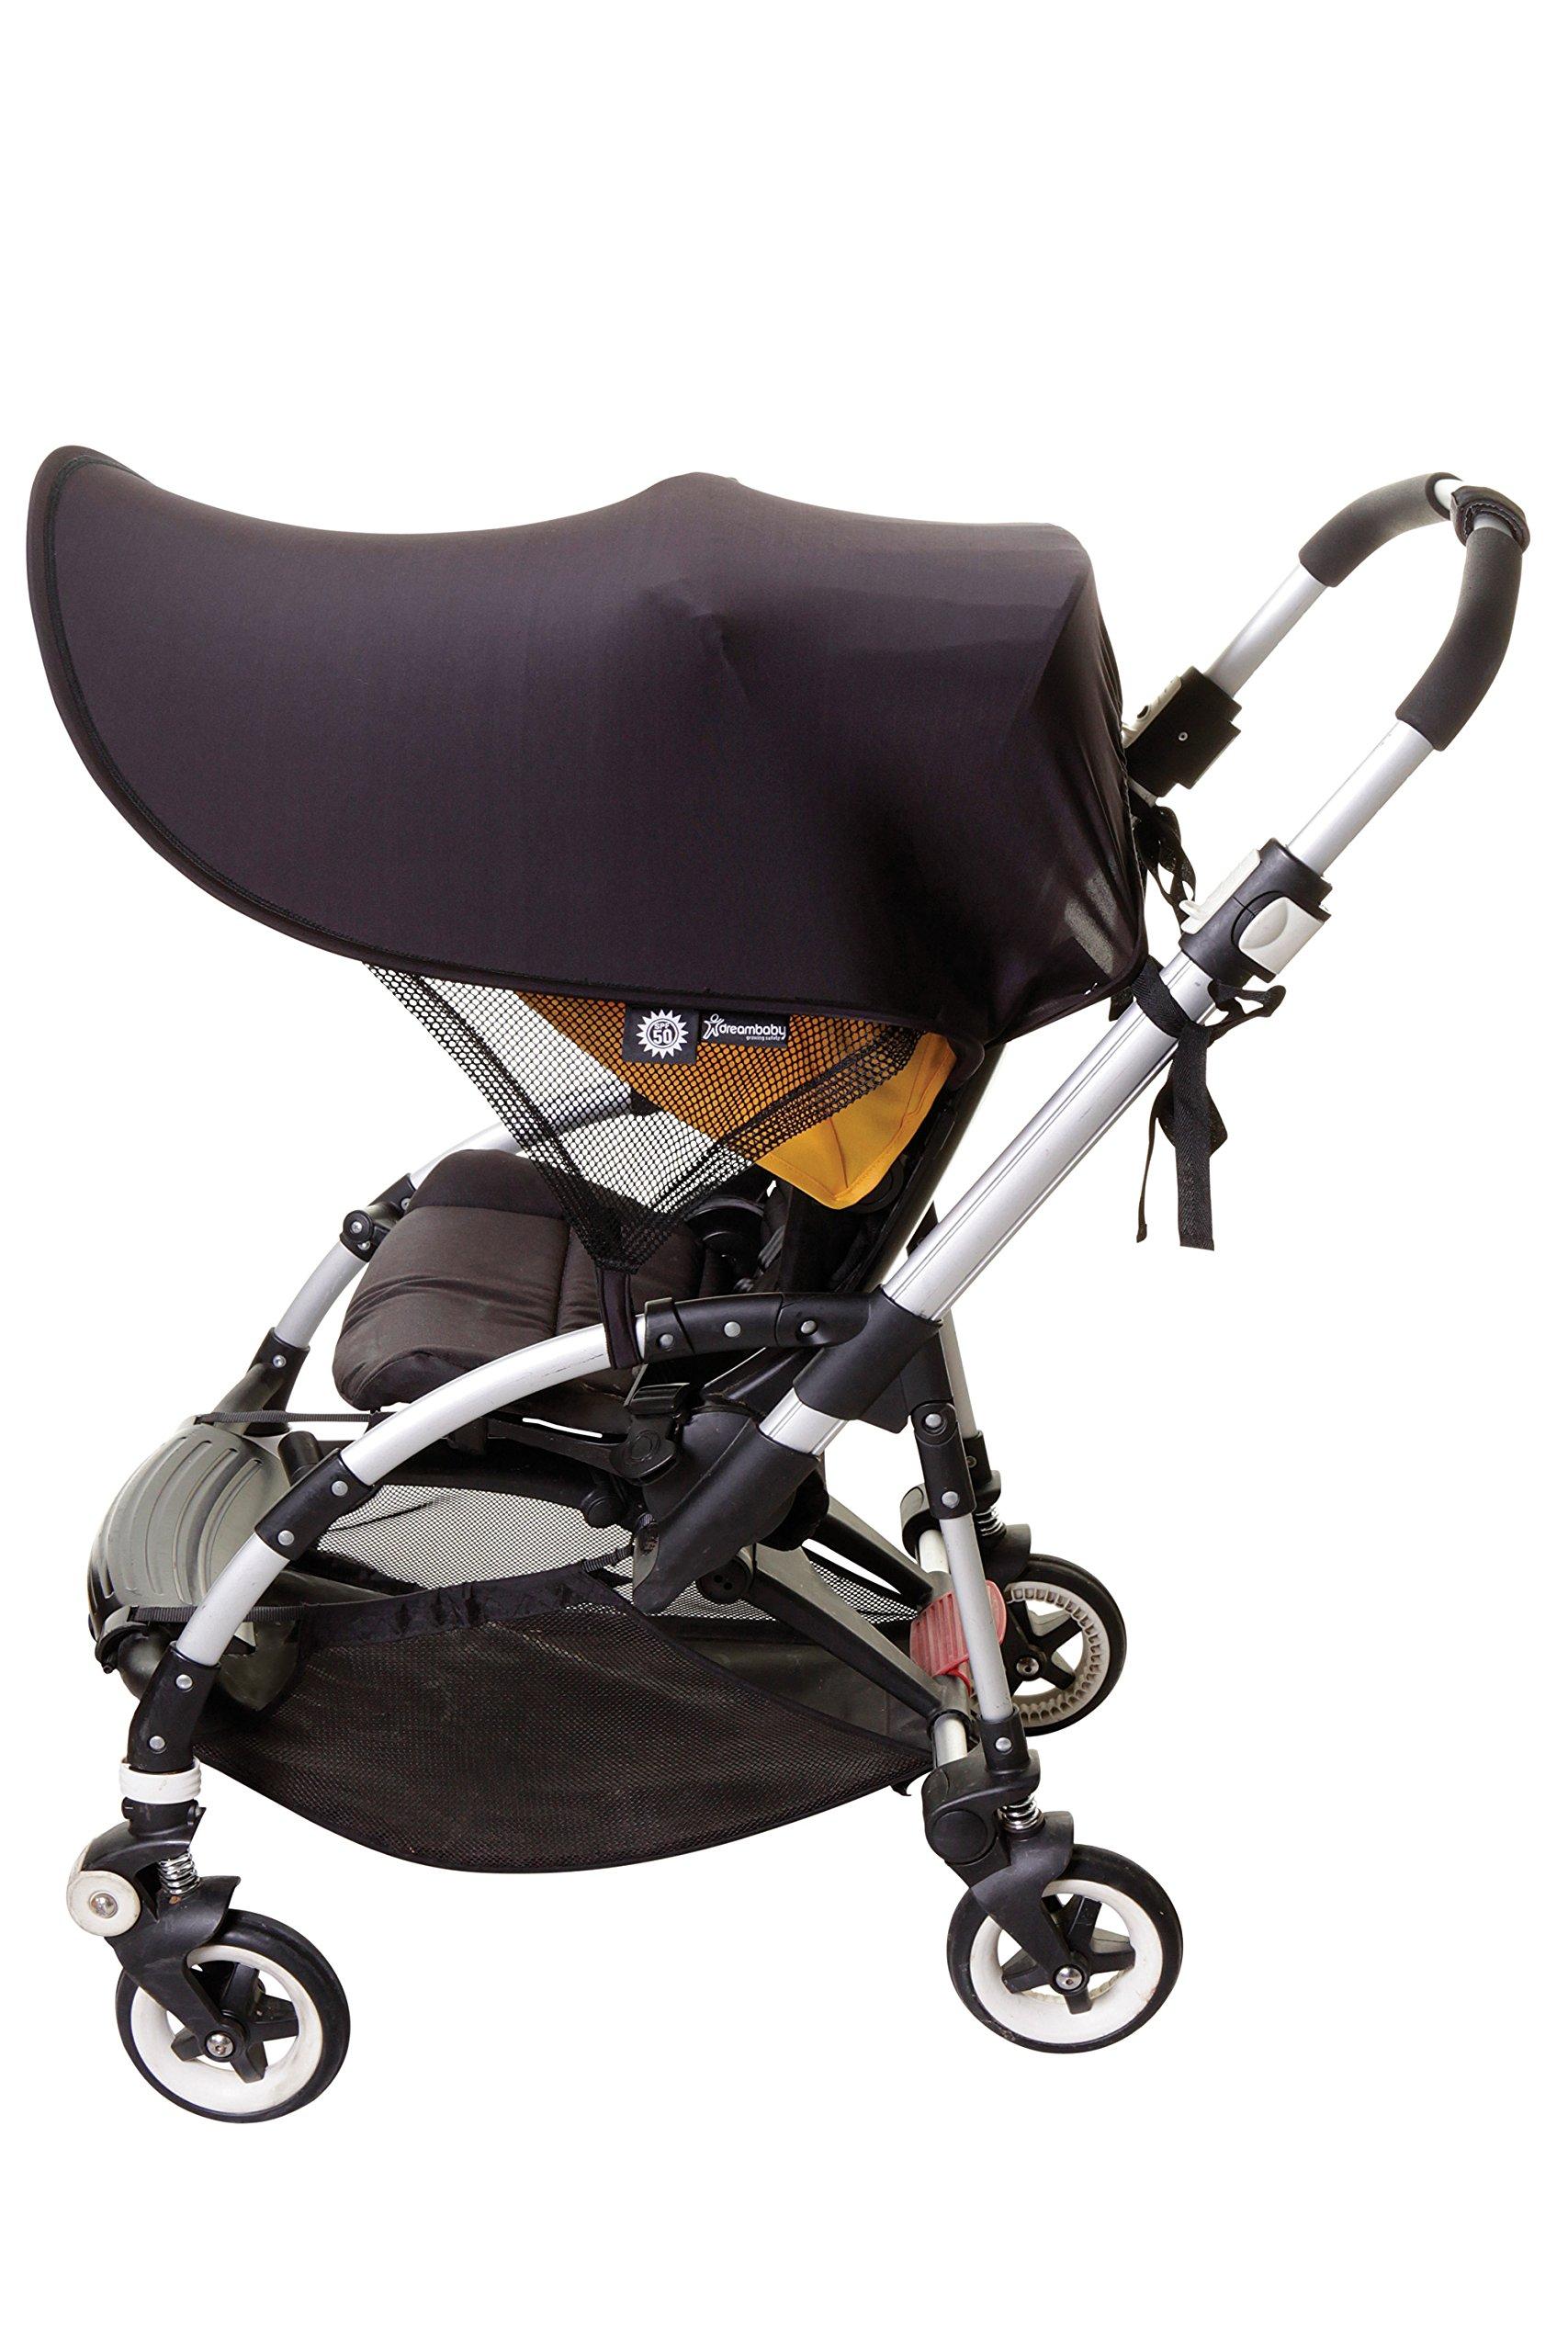 Dreambaby Strollerbuddy Extenda-Shade, Black, Large